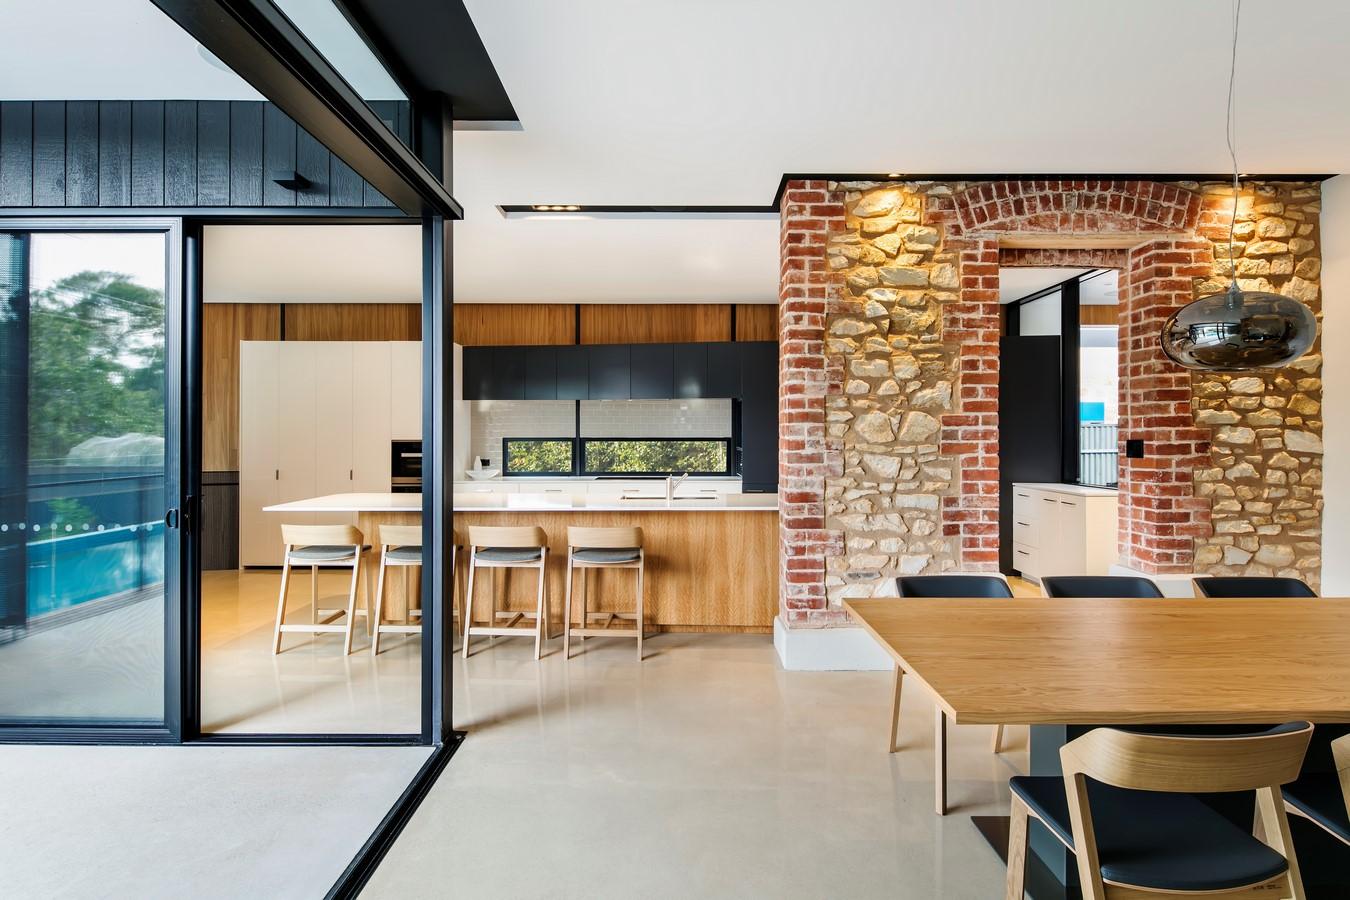 5111 Veil + Mortar by Khab Architects: Sheet 2